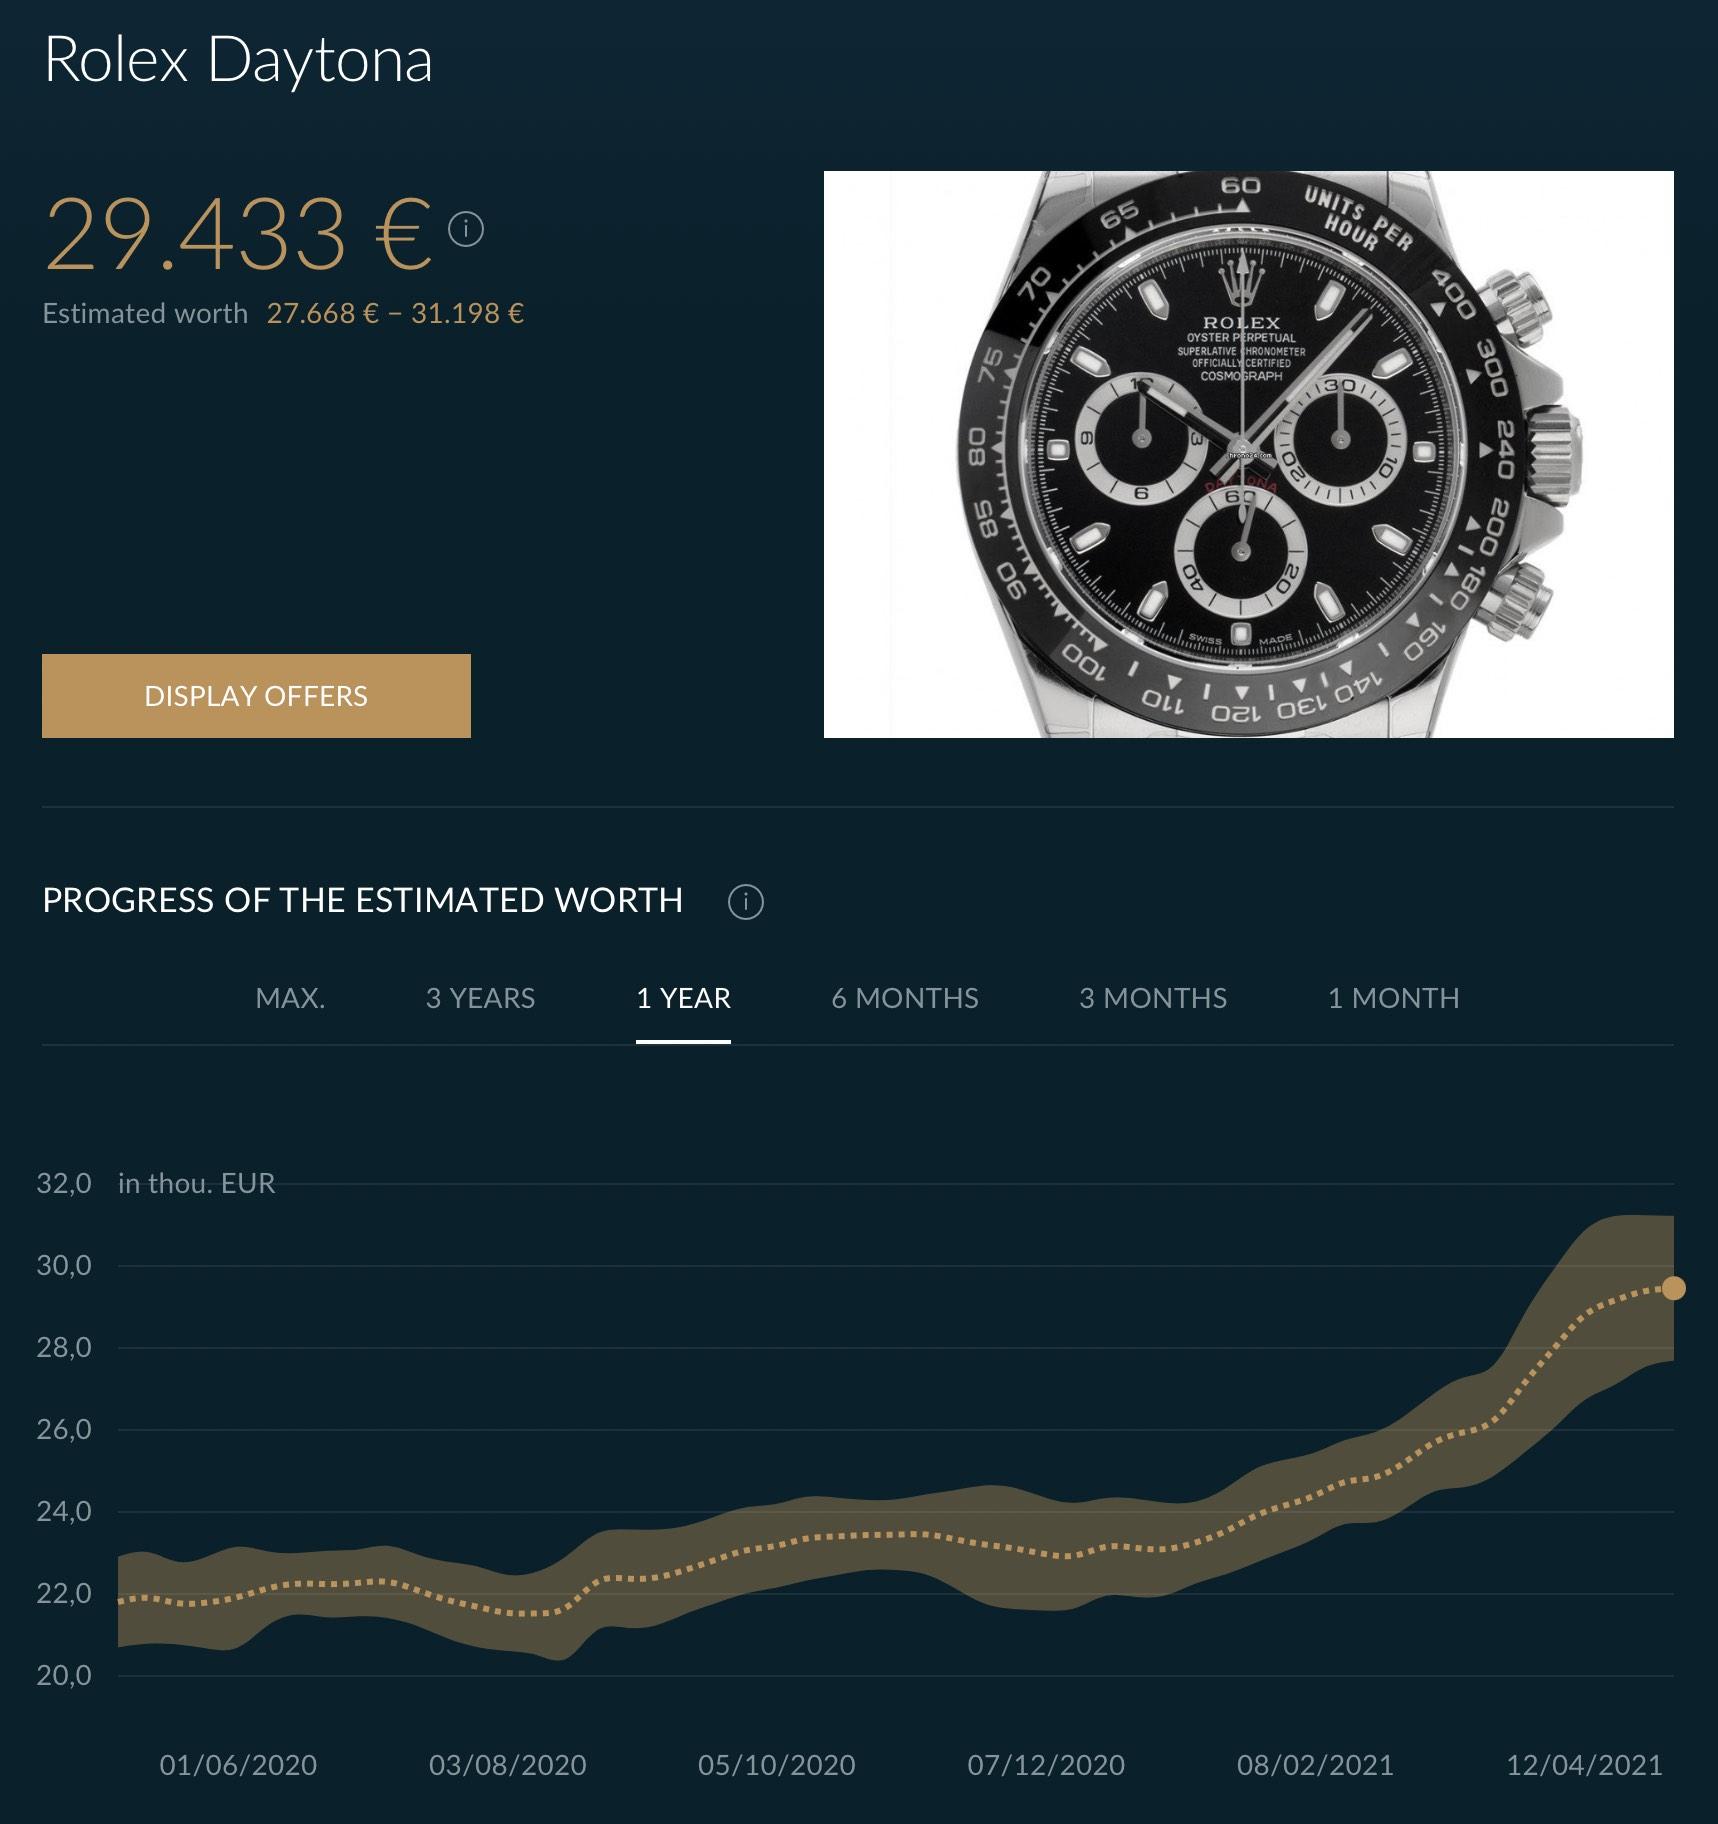 Rolex Daytona 116500LN Market analysis - continuous and insane rise price - 14